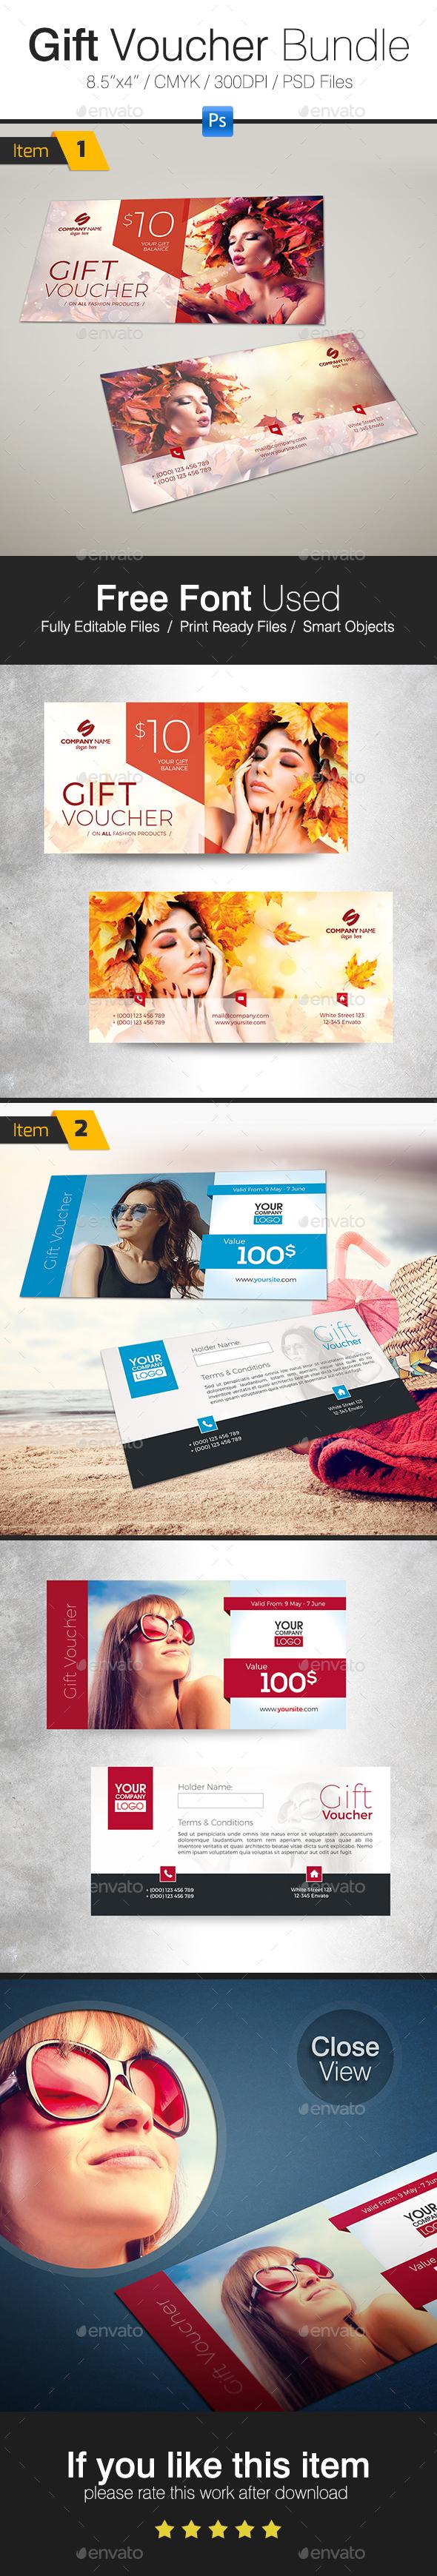 Seasonal Gift Voucher Bundle - Cards & Invites Print Templates